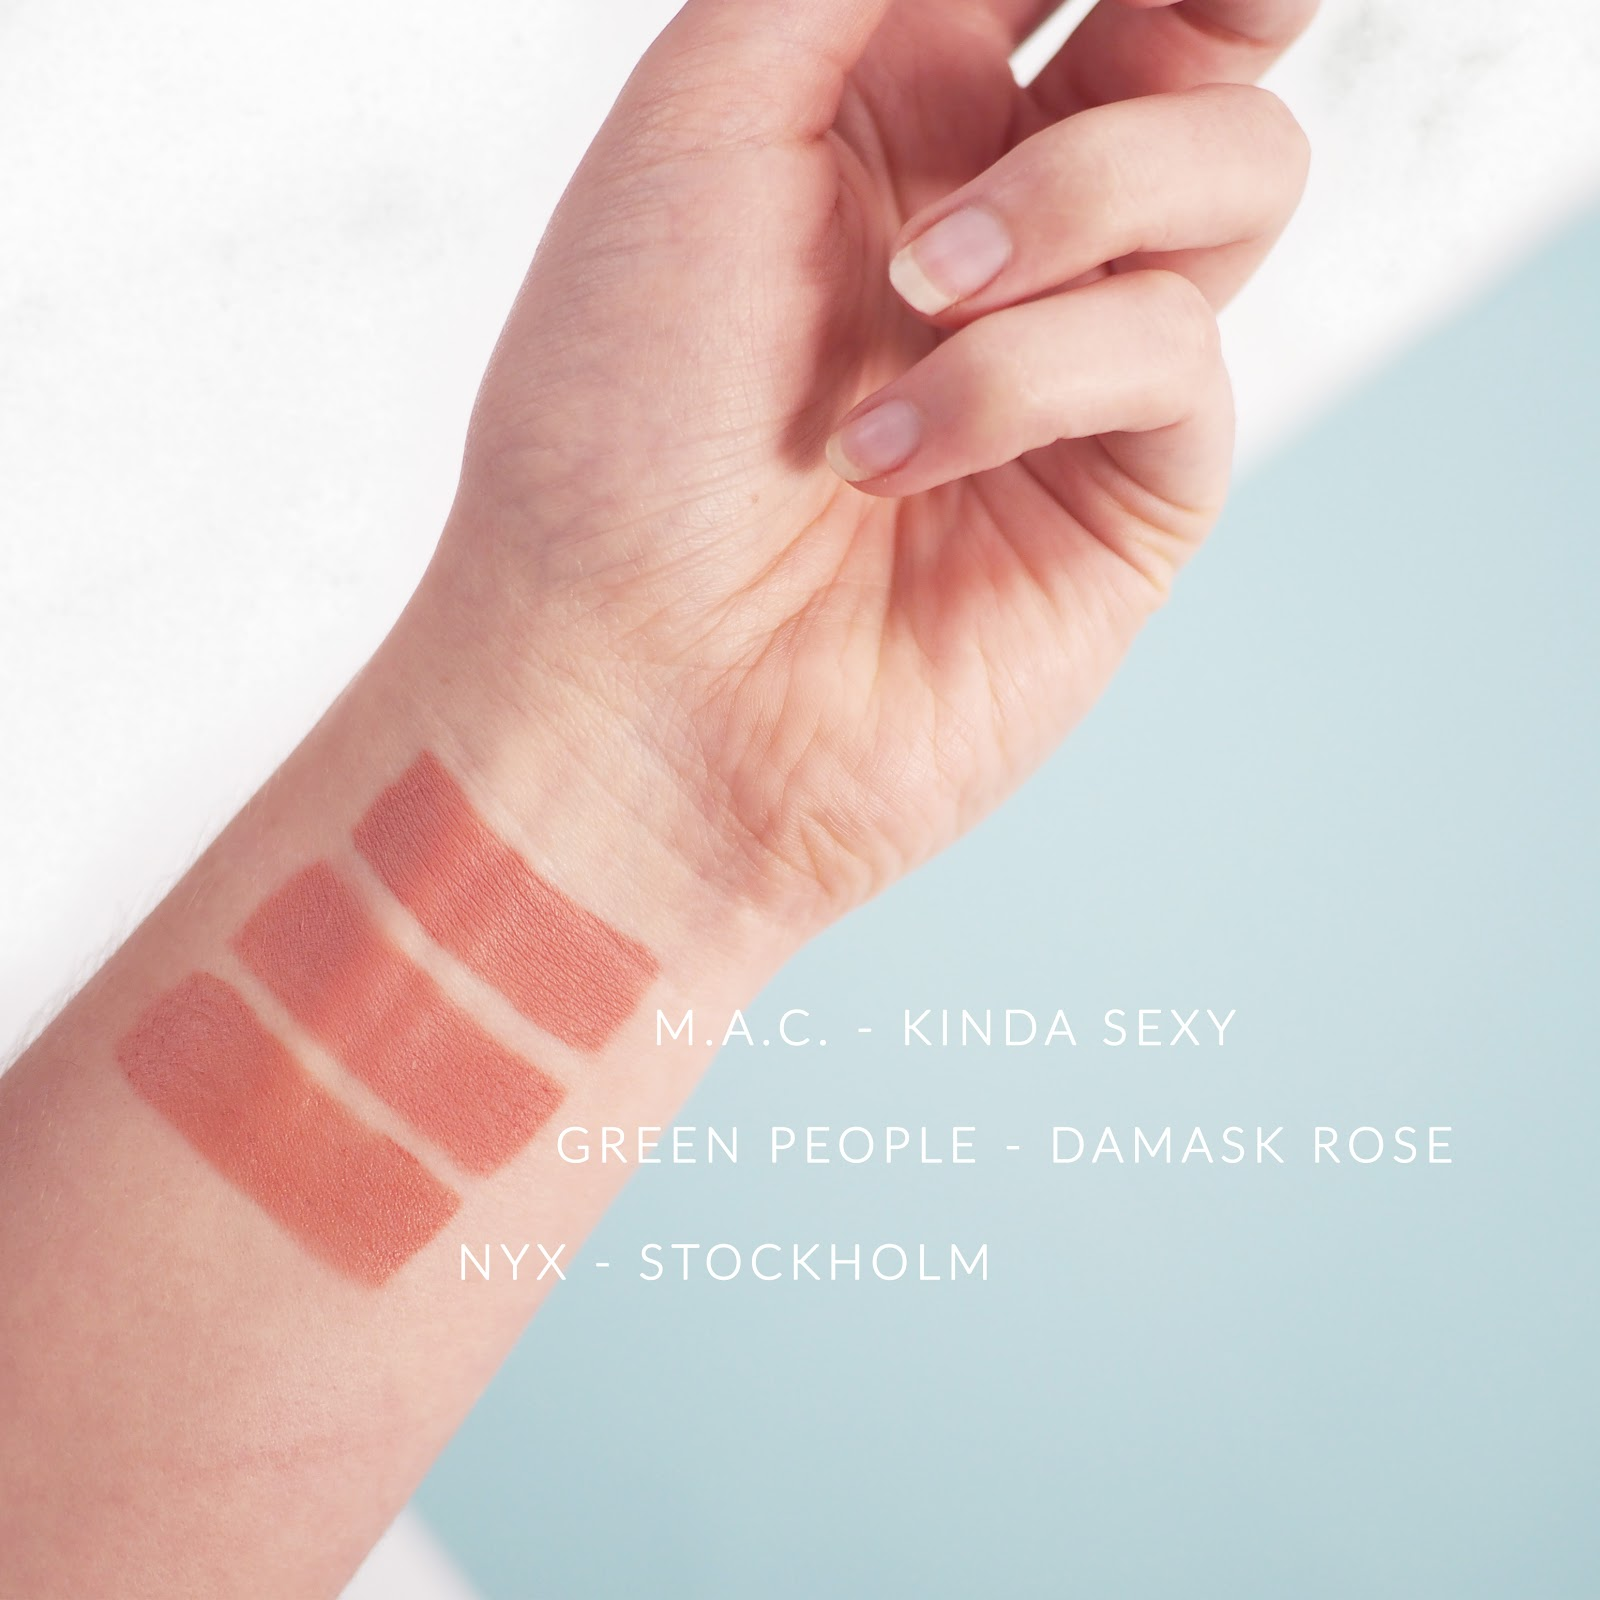 Green People's Damask Rose Velvet Matte Lipstick, nude lipstick